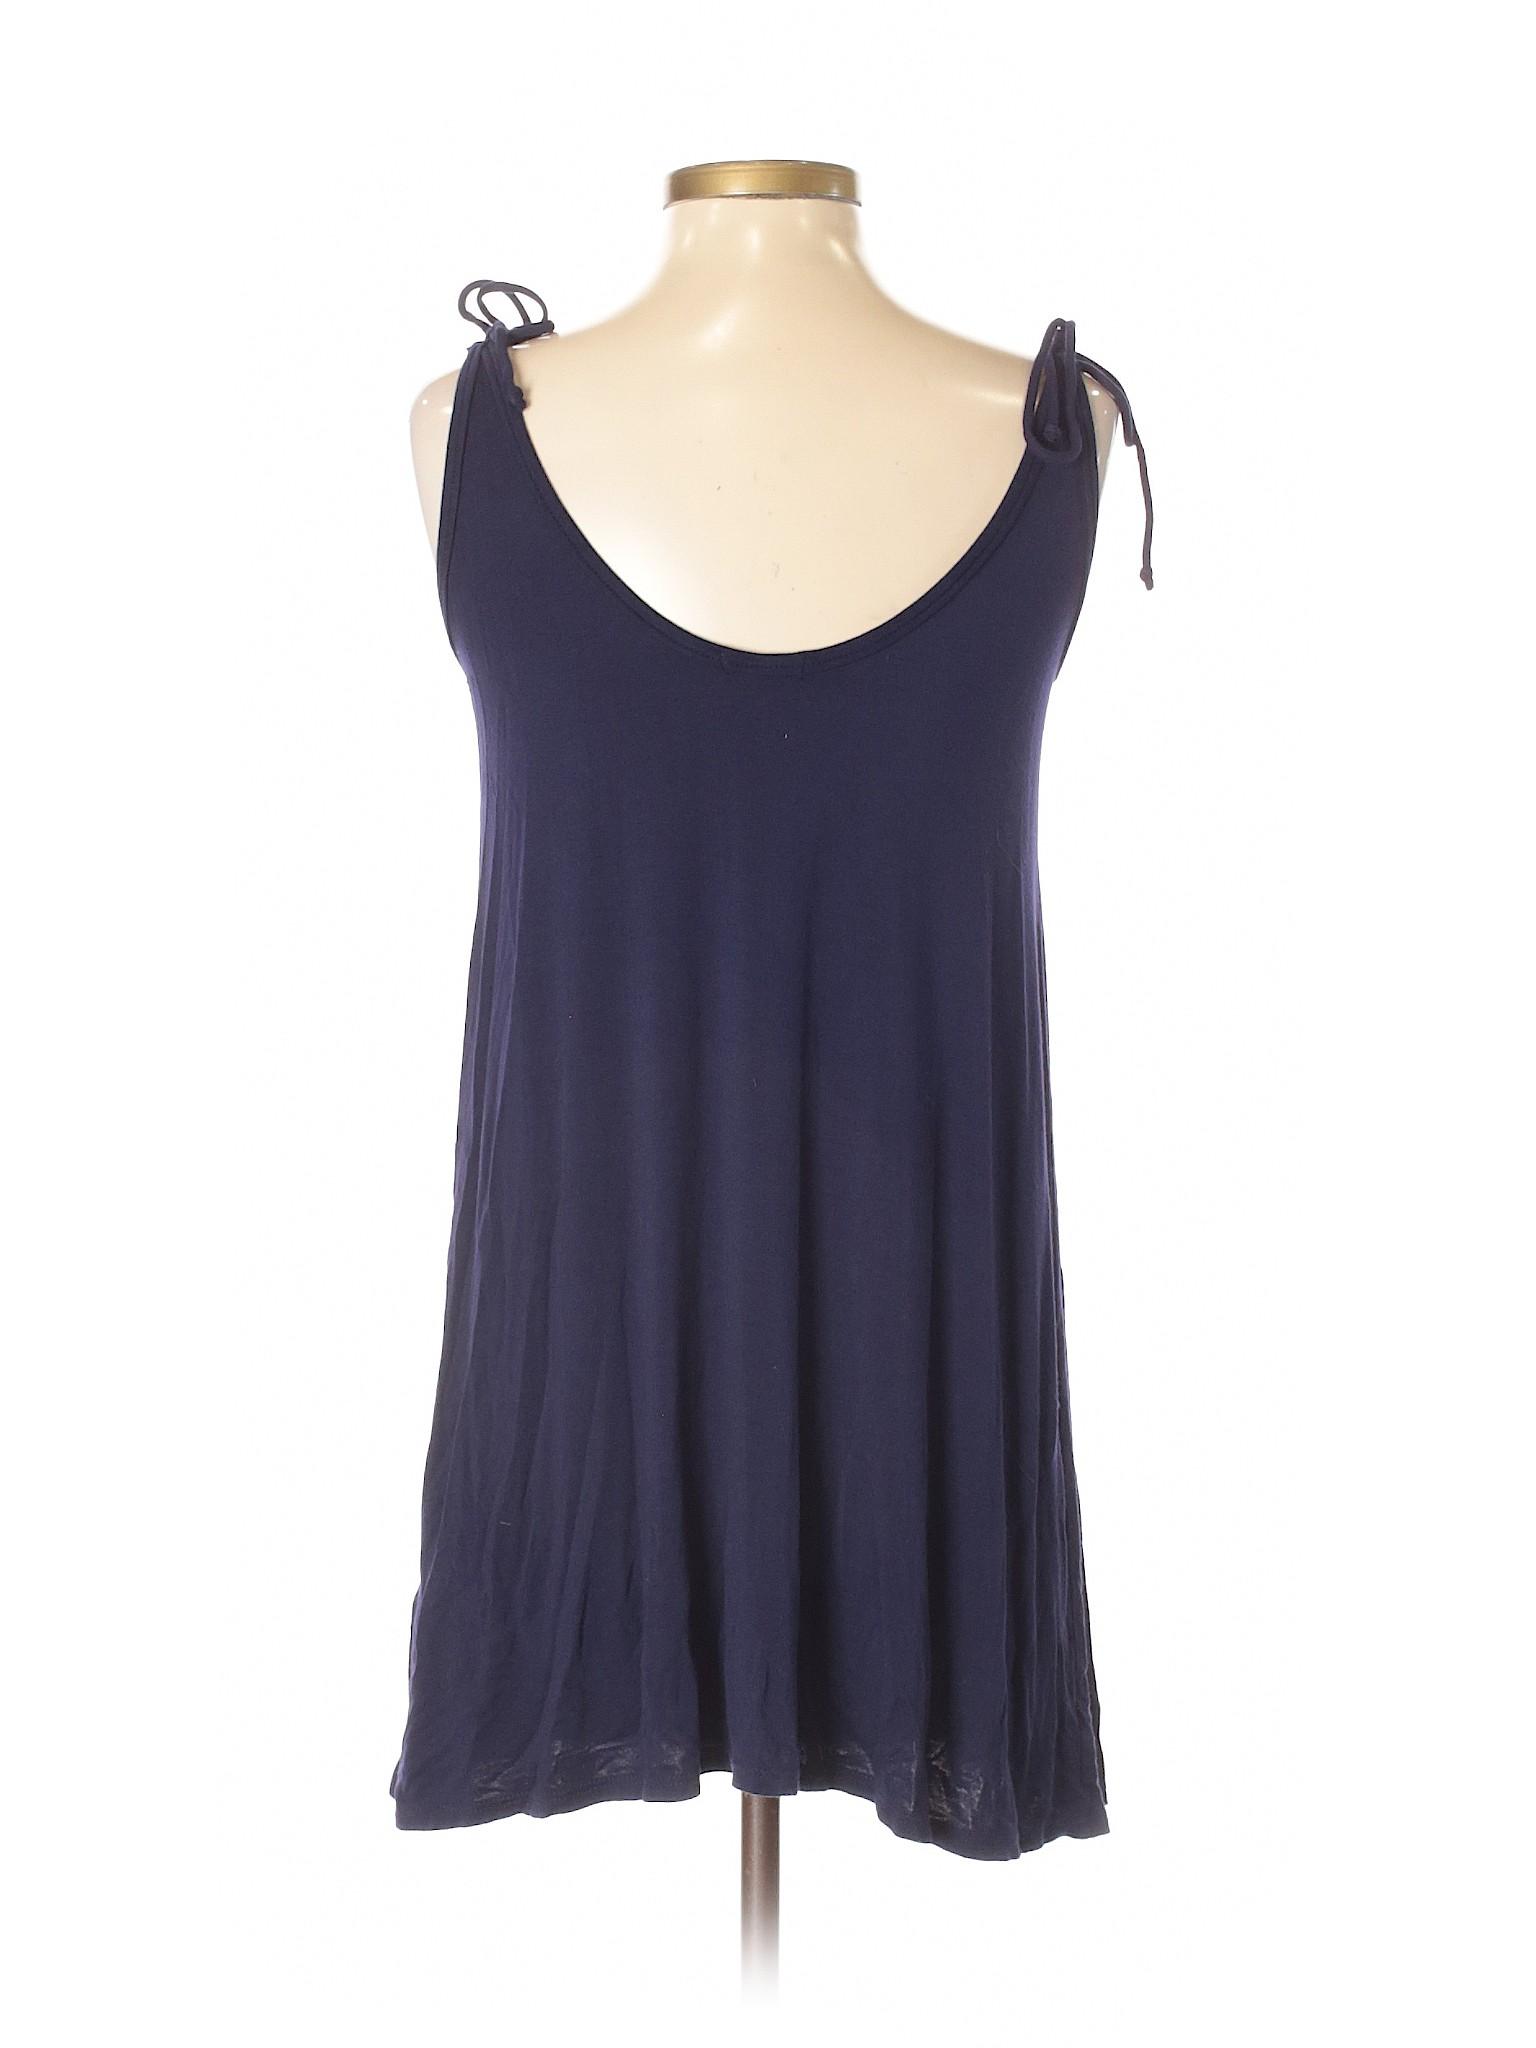 Blue Selling Kimchi Dress Blue Casual Kimchi Casual Selling Dress HxwqRCYHr